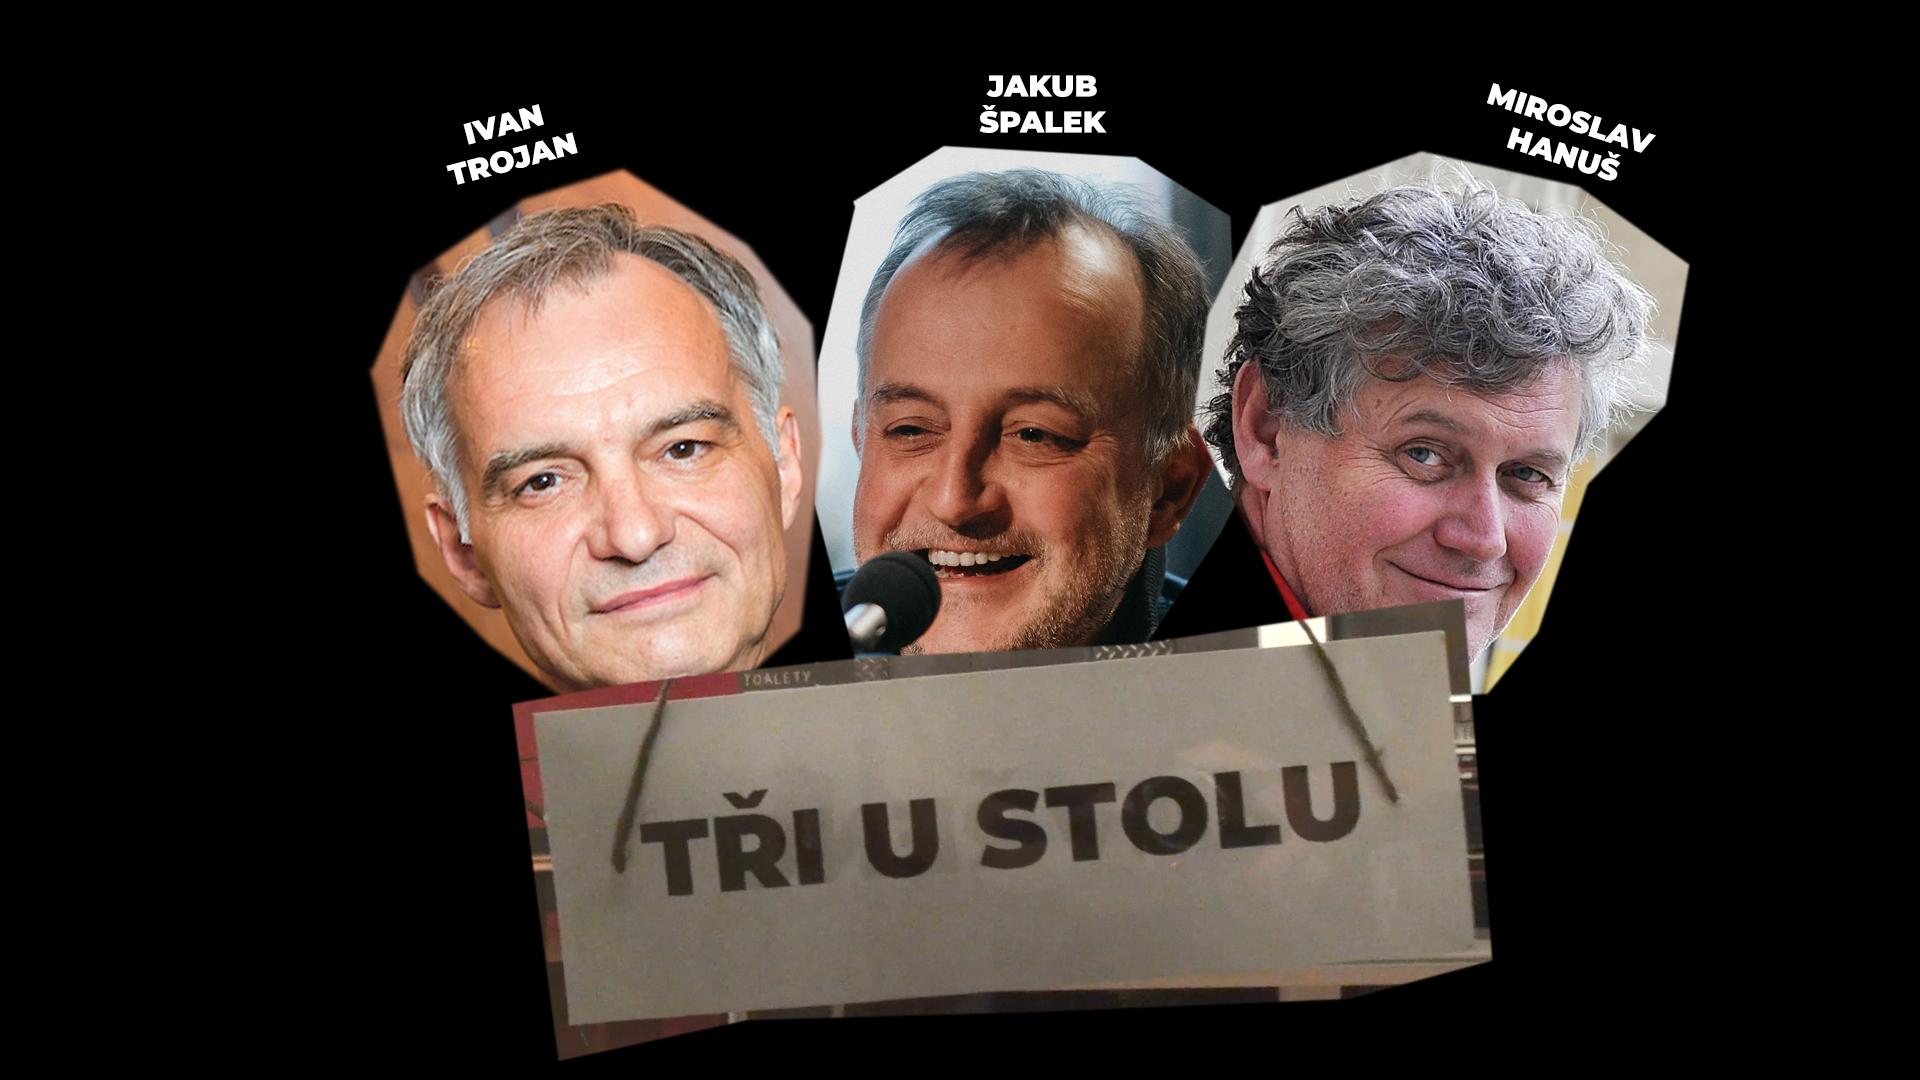 TŘI U STOLU – Ivan Trojan a Miroslav Hanuš a Jakub Špalek – livestream